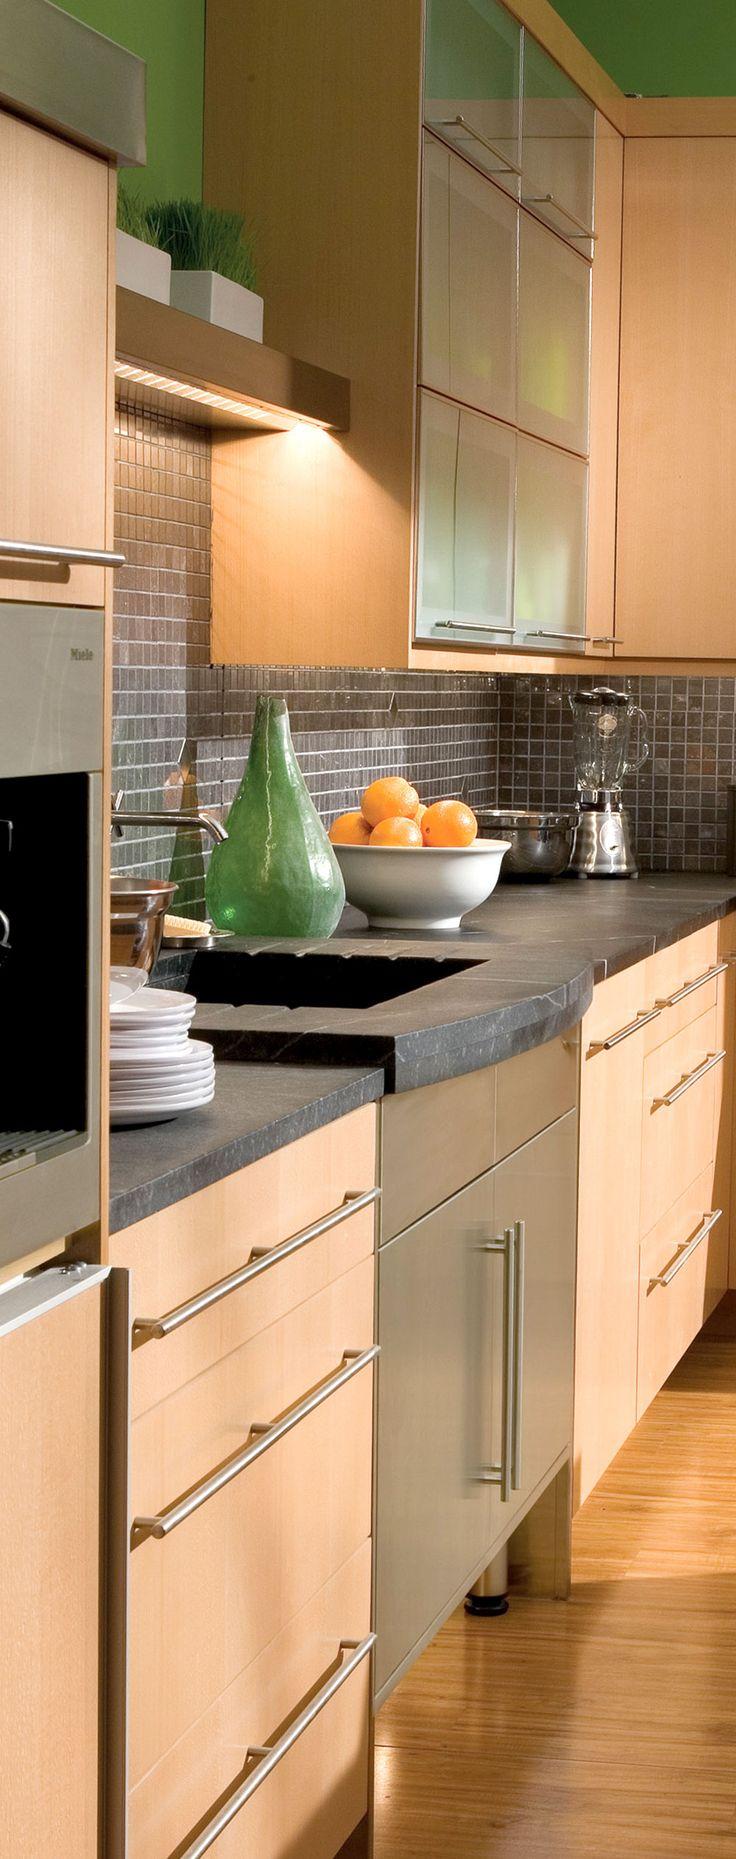 36 best Kitchen images on Pinterest | Soapstone countertops ...